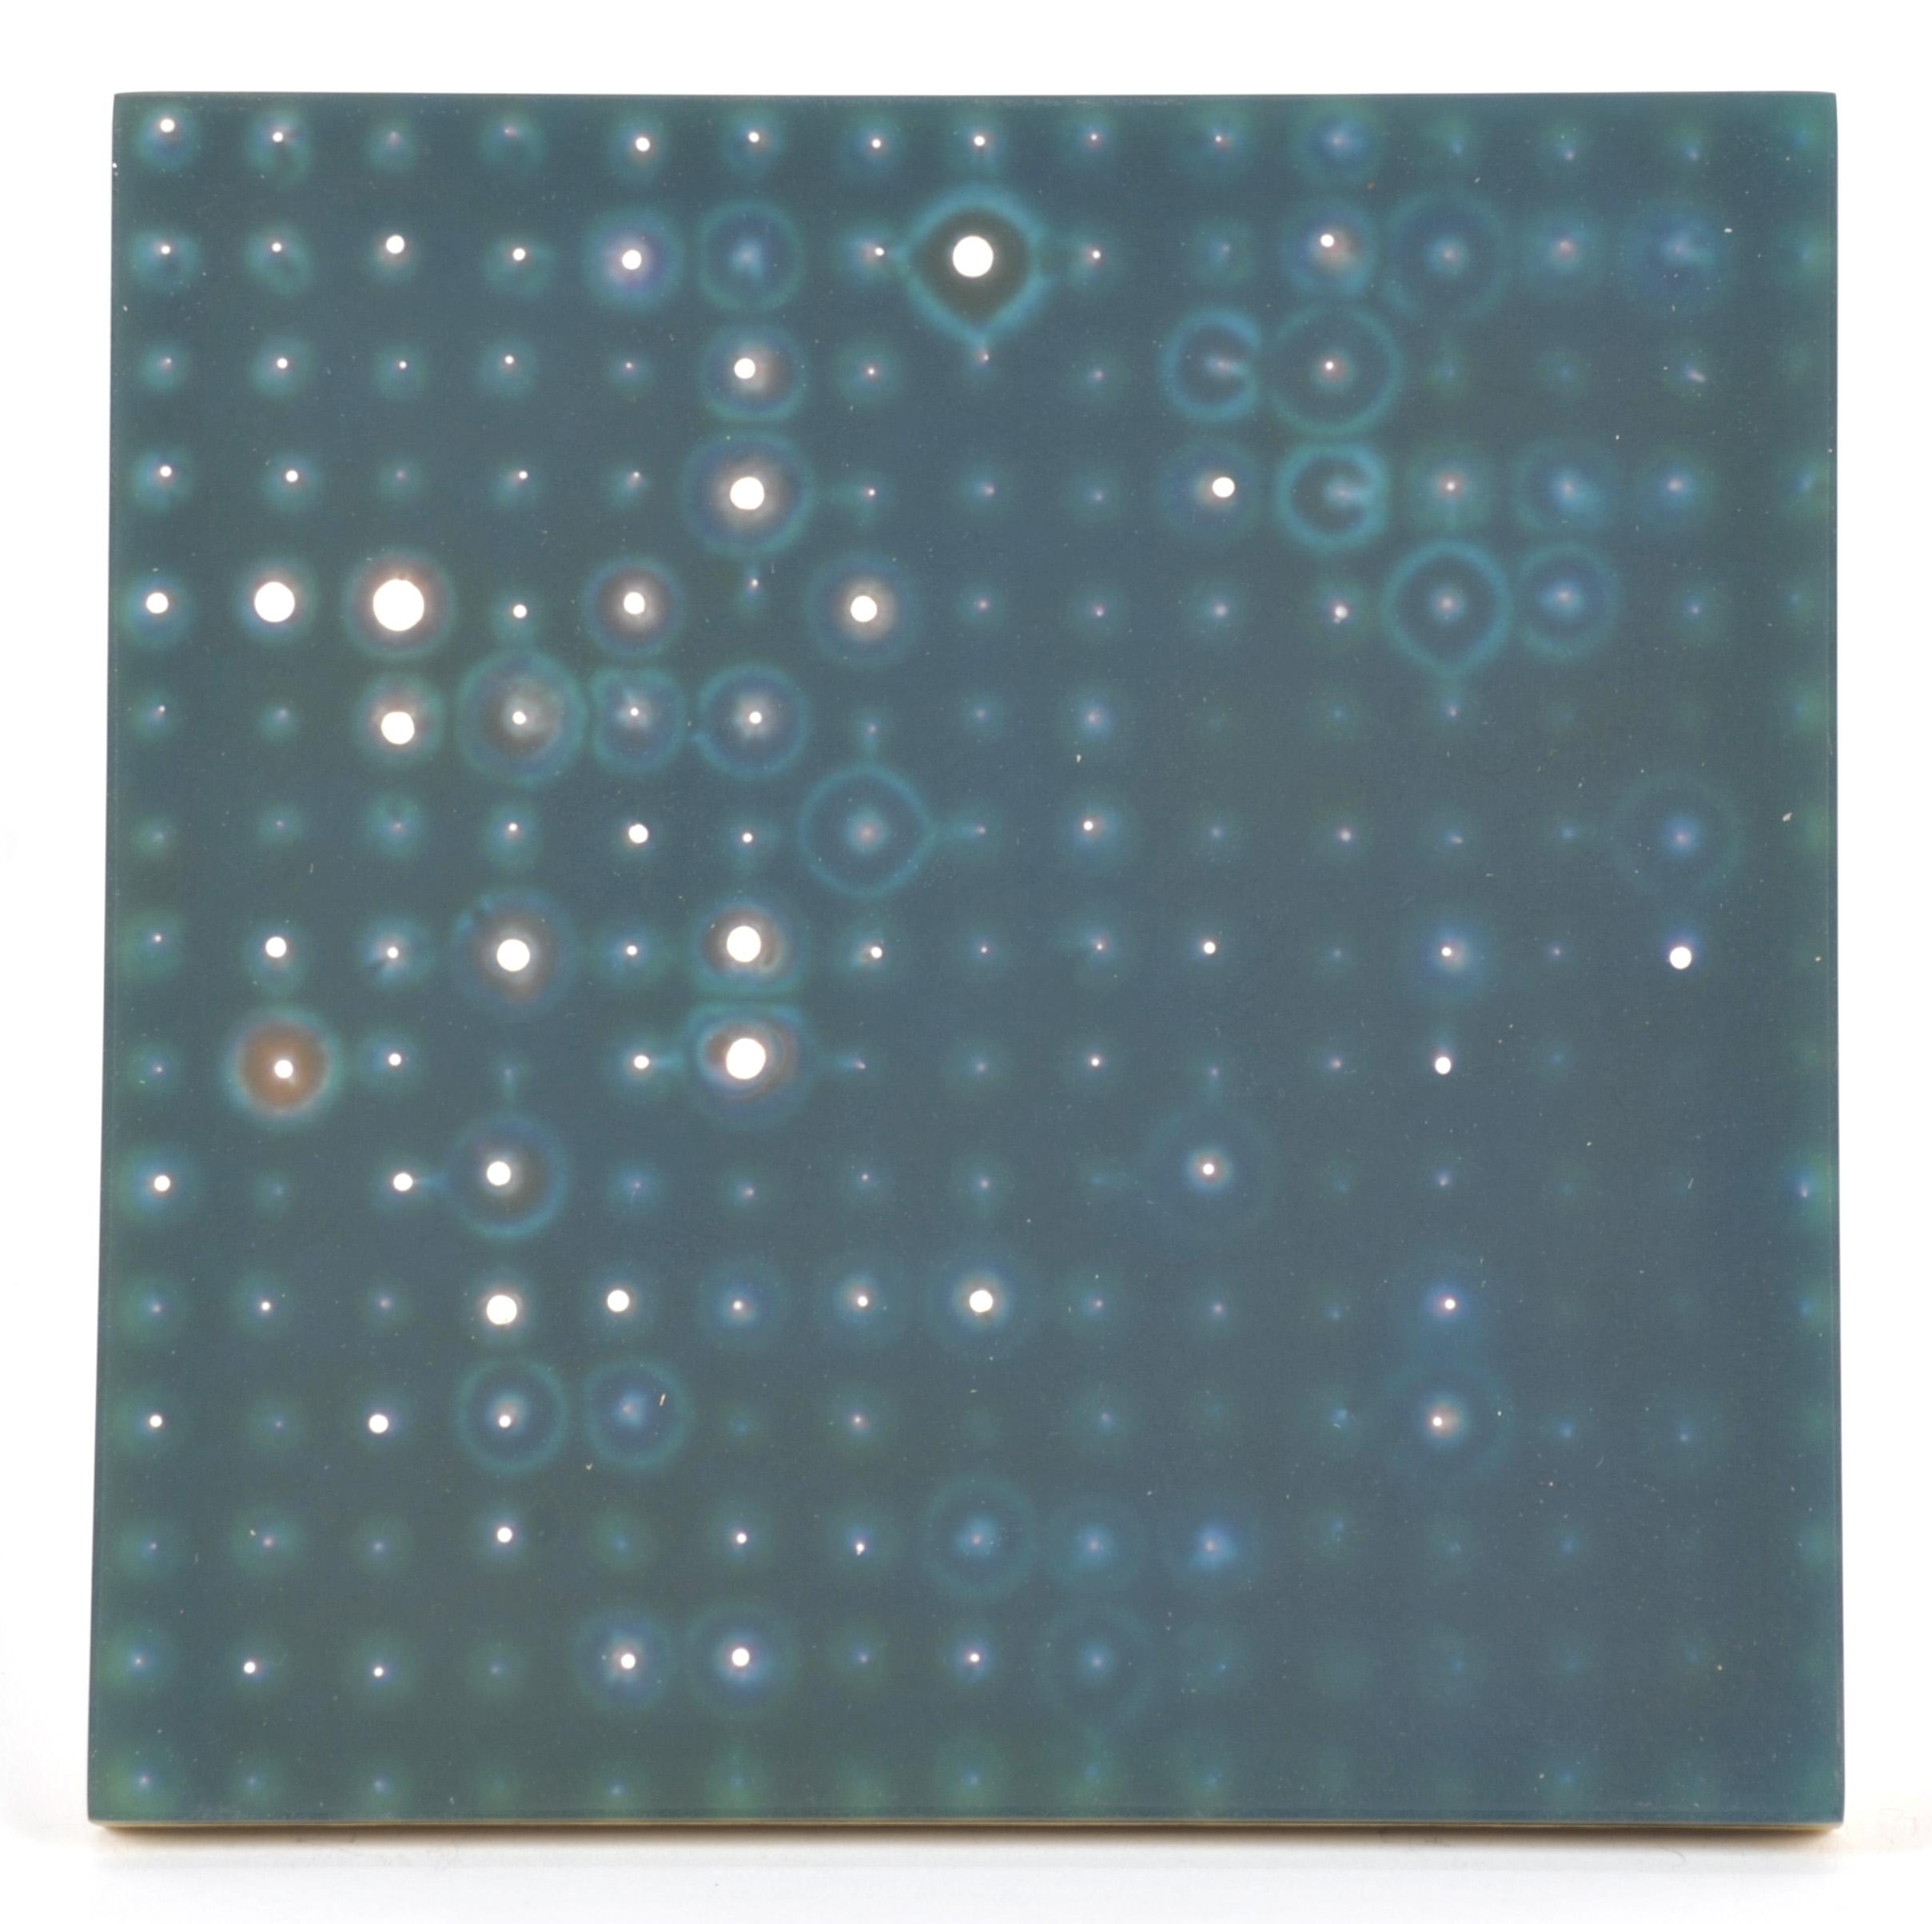 Tom DeGroot     909  ,  2010  Plaster and resin